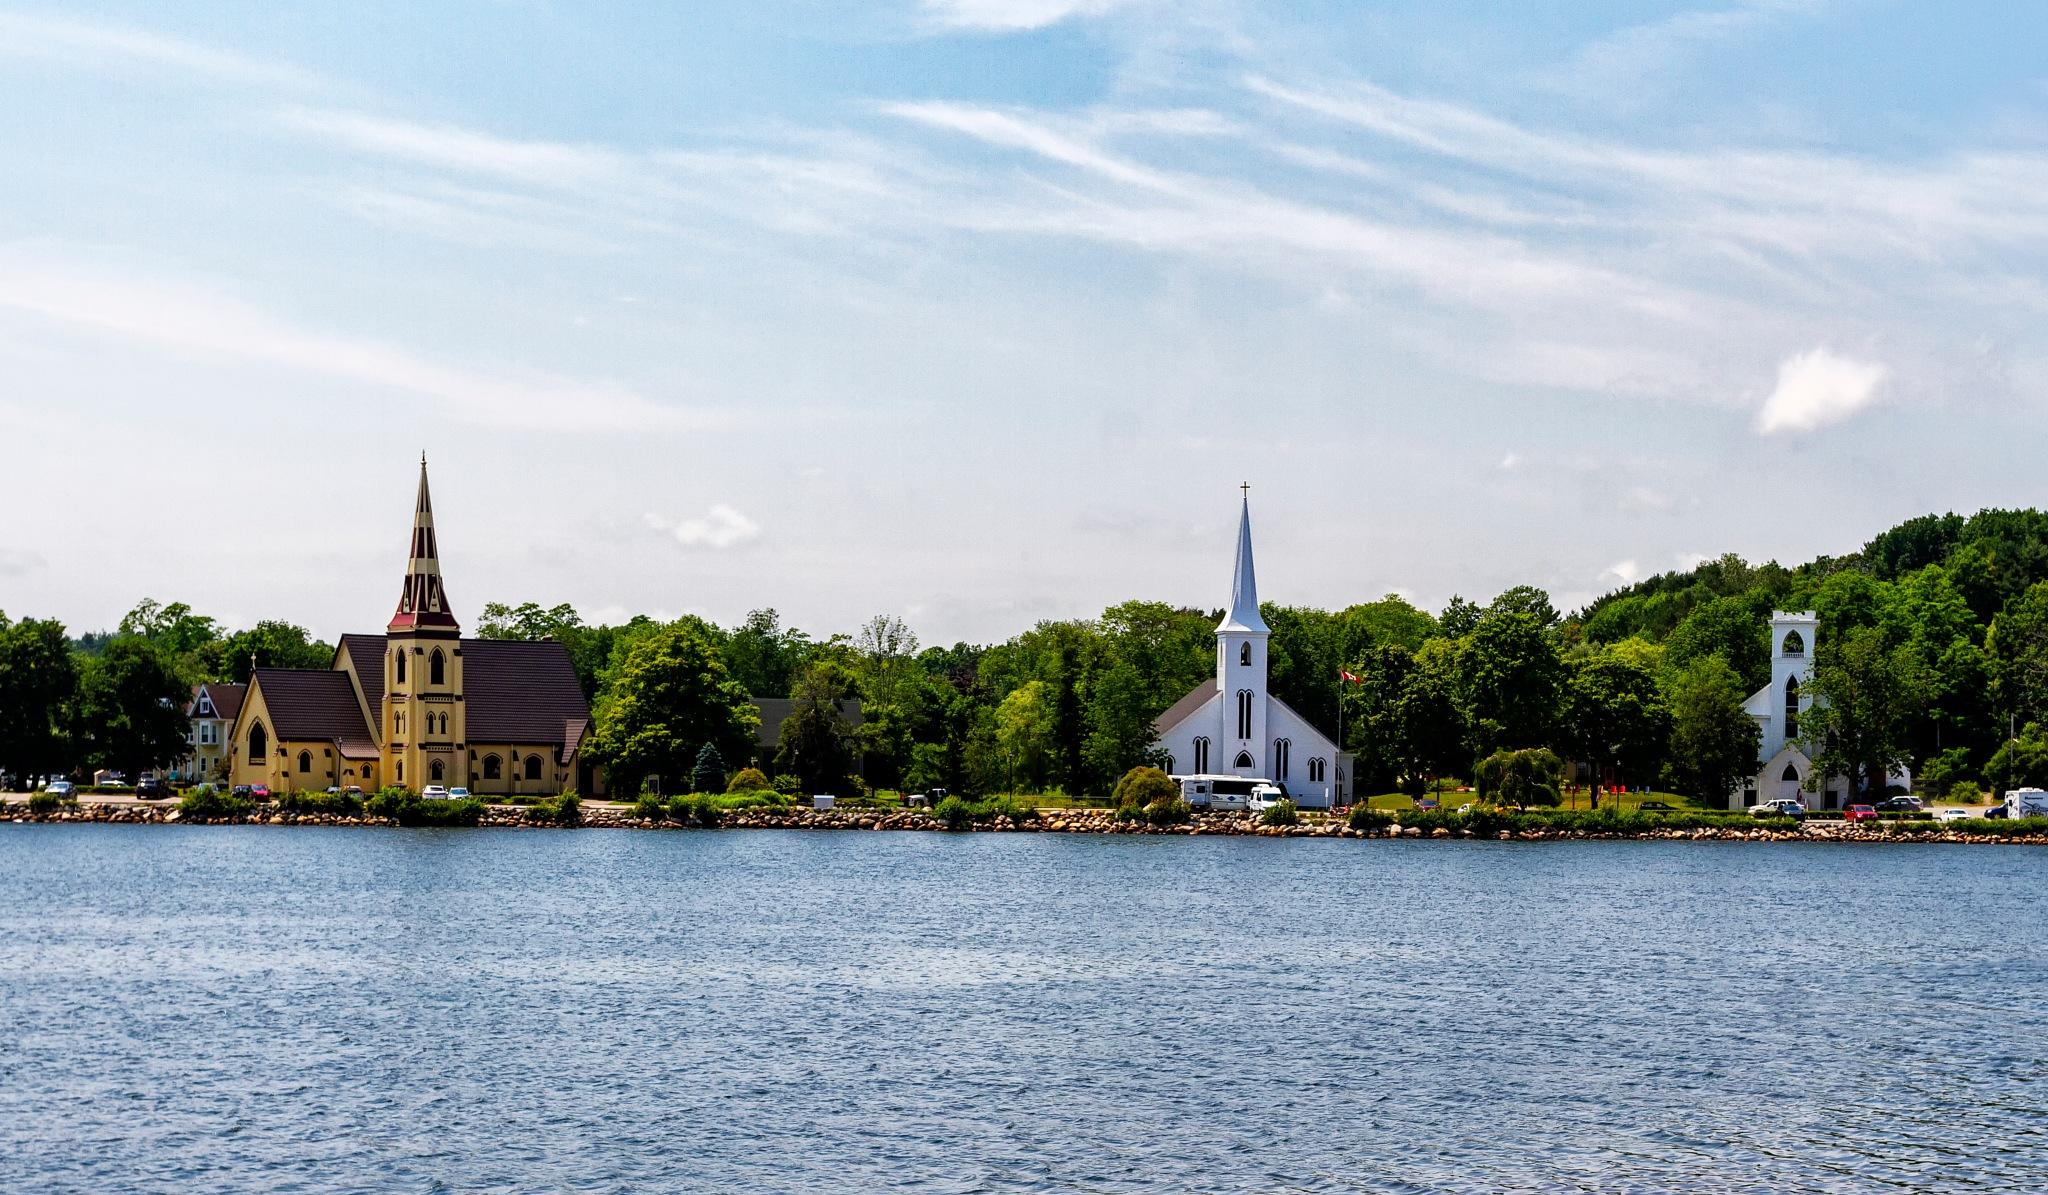 Three Churchs by Joe Chrvala